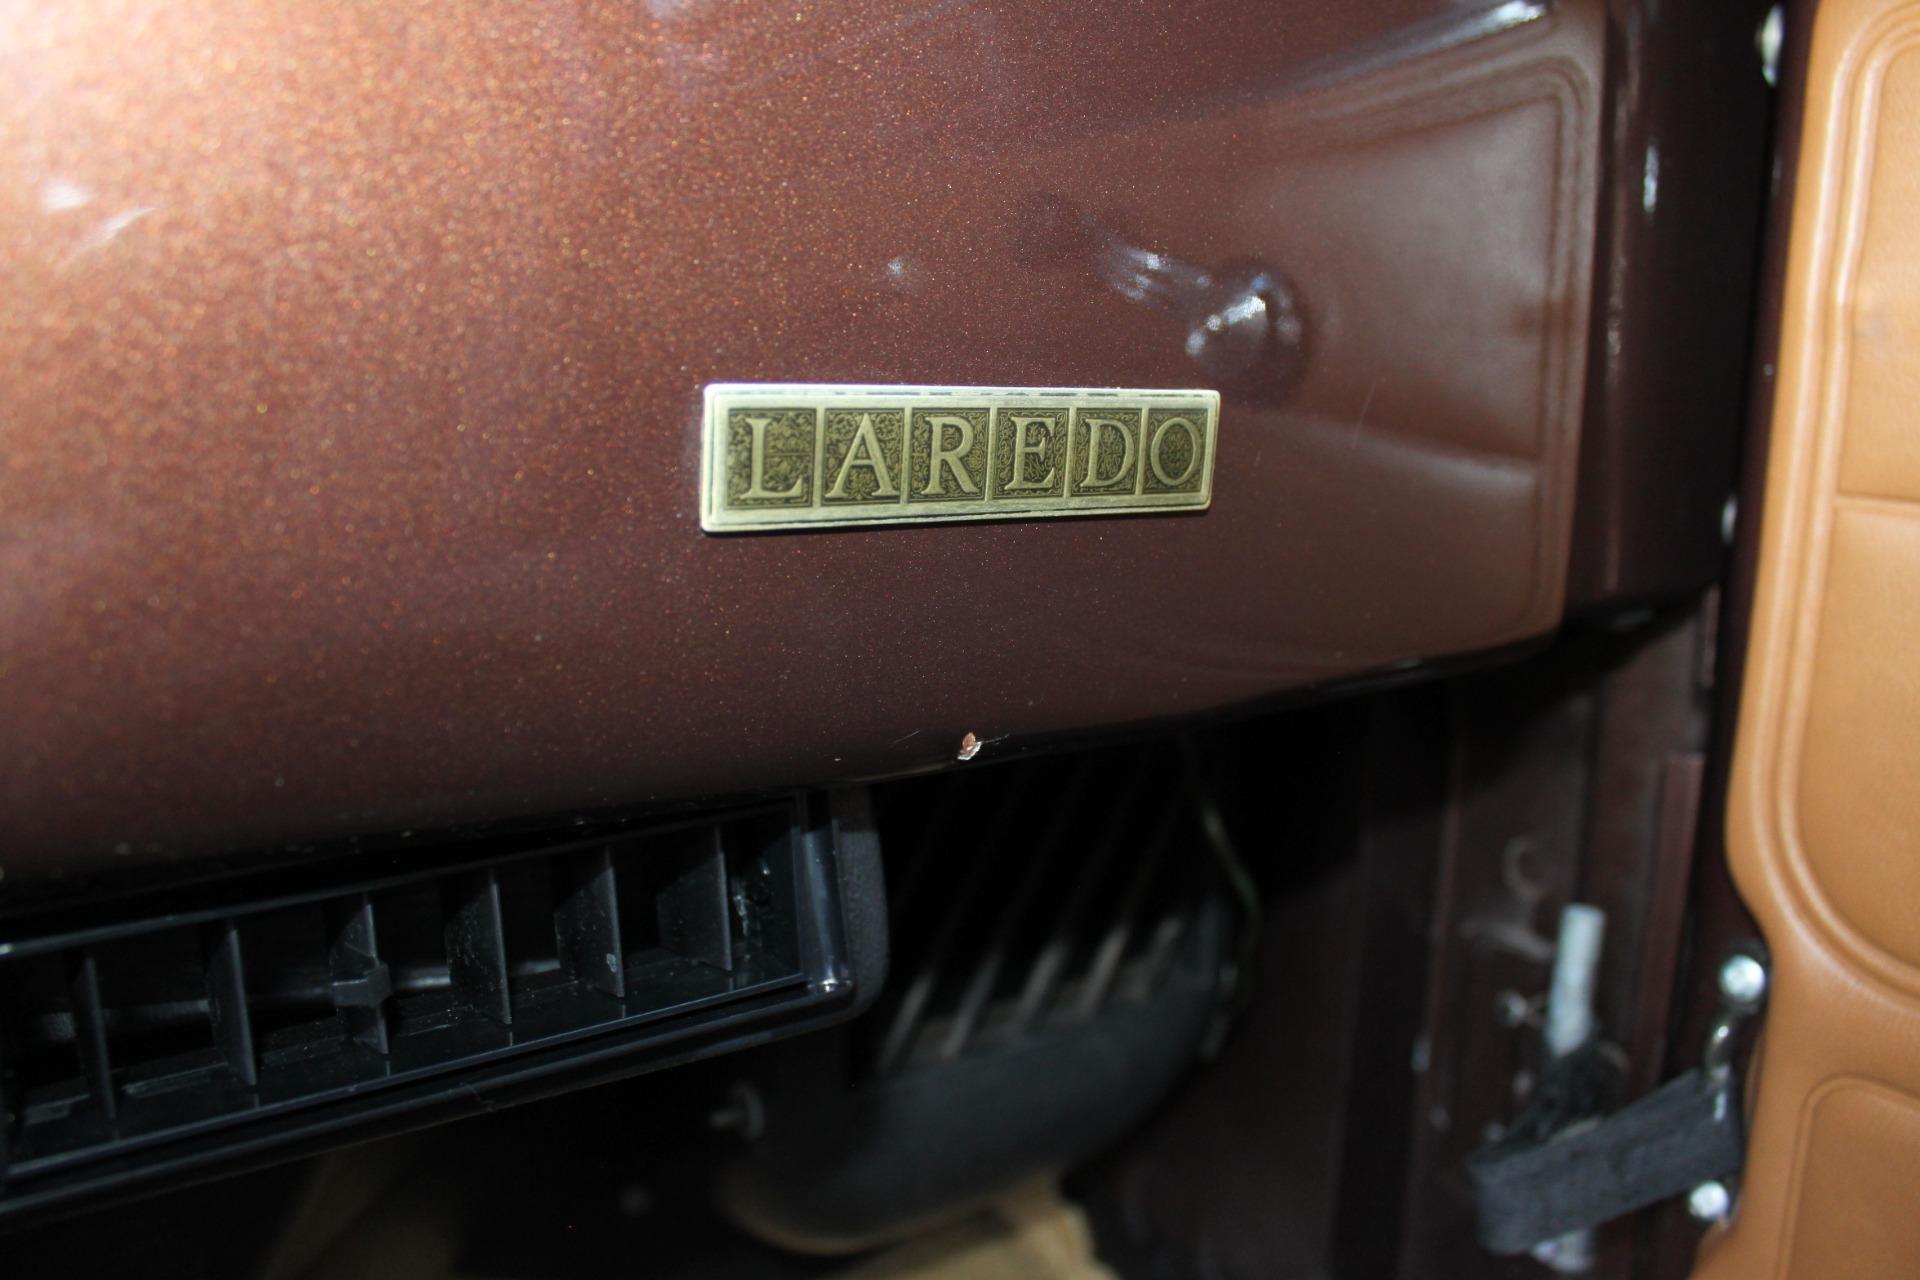 Used-1985-Jeep-CJ-7-Laredo-4WD-Collector